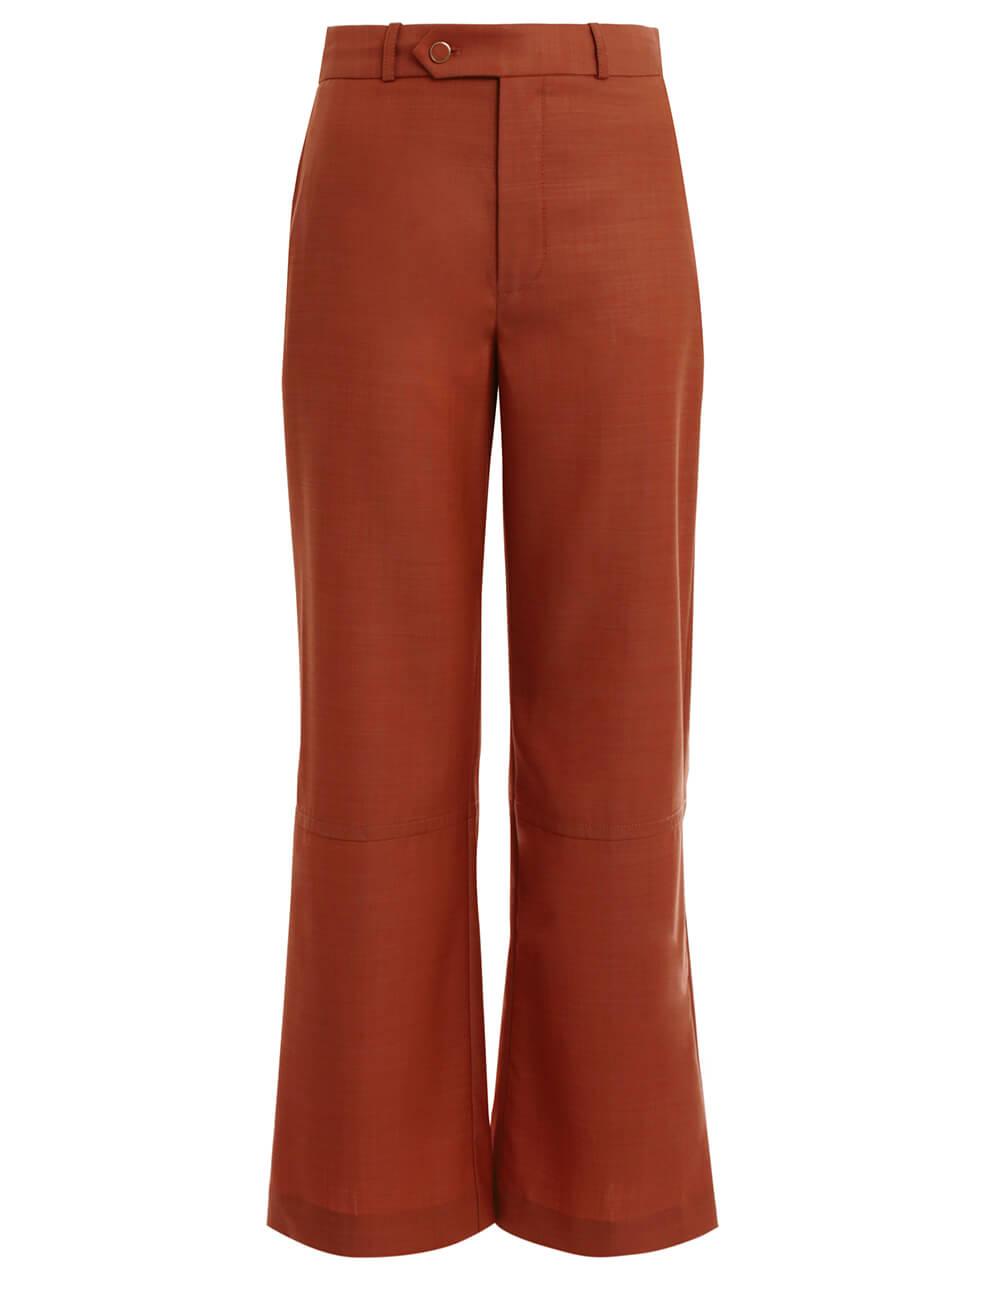 Resistance Crop Trouser